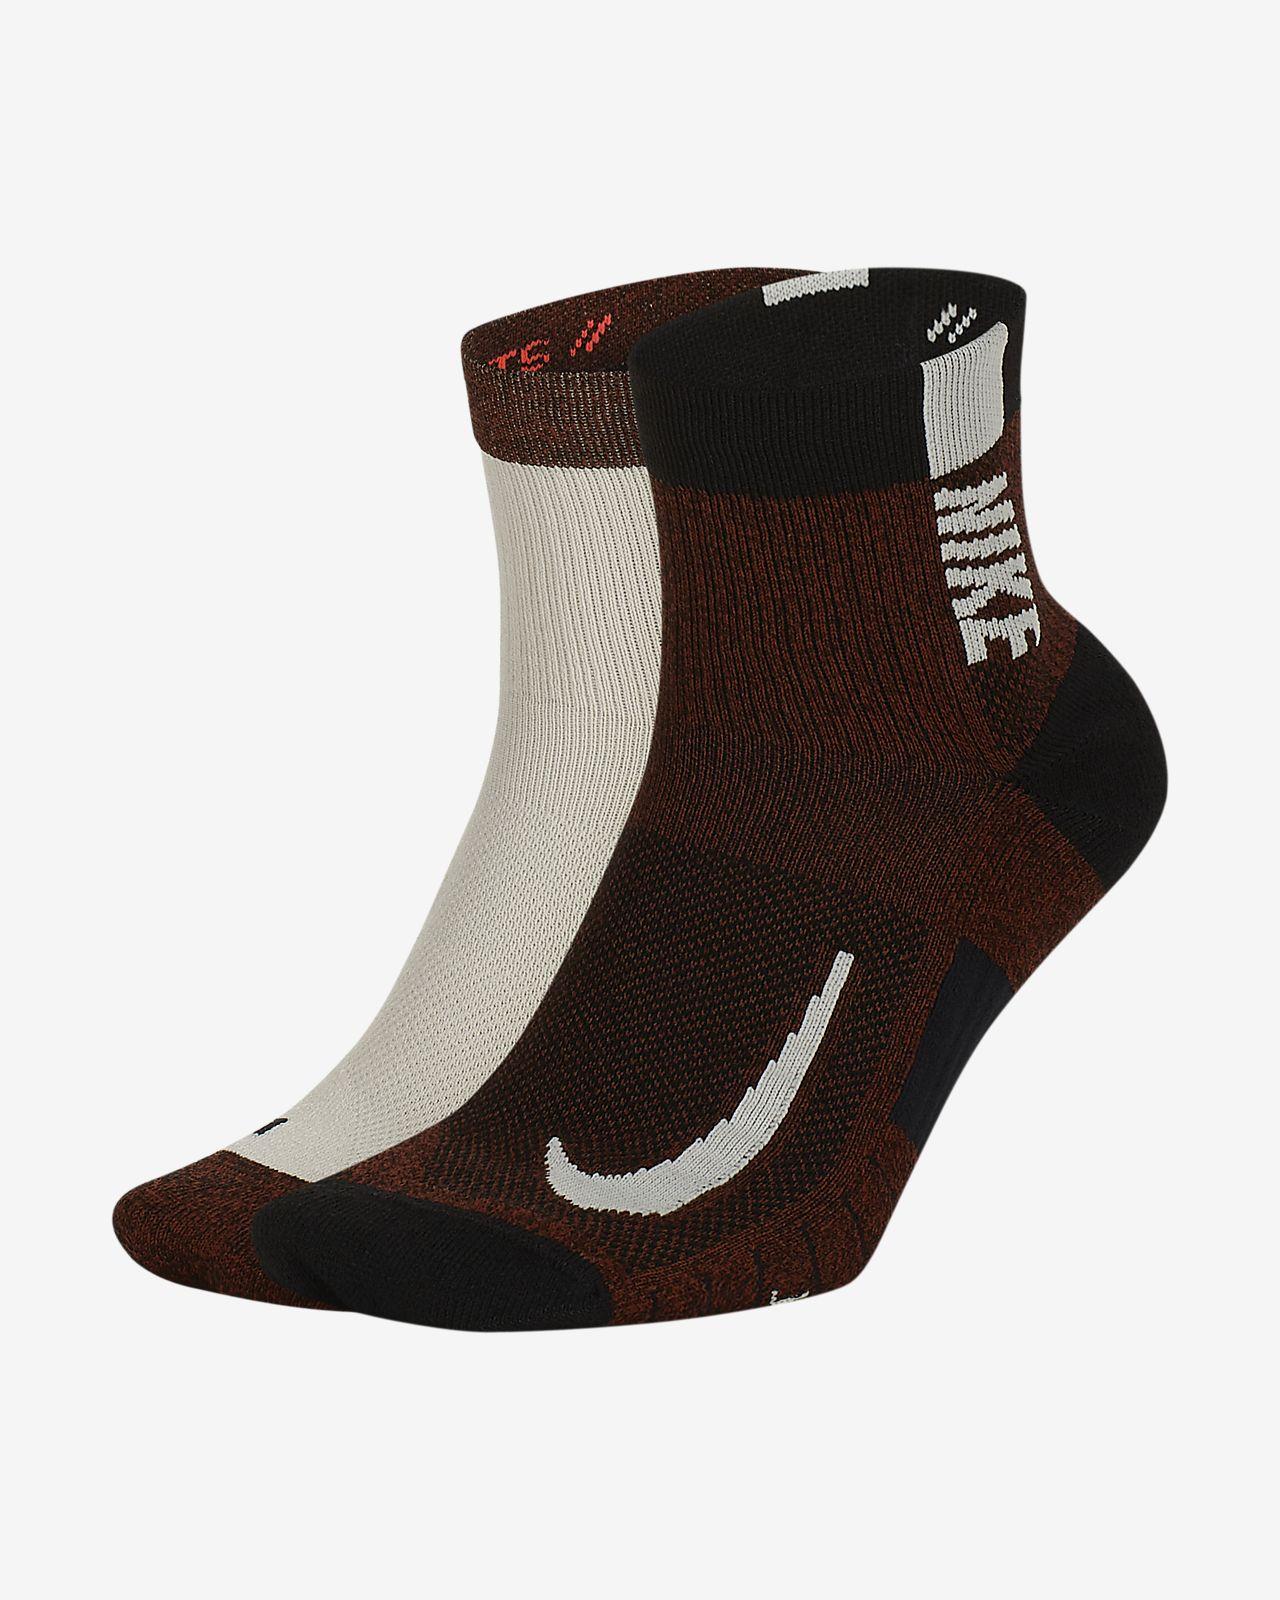 Nike Multiplier bokazokni (2 pár)